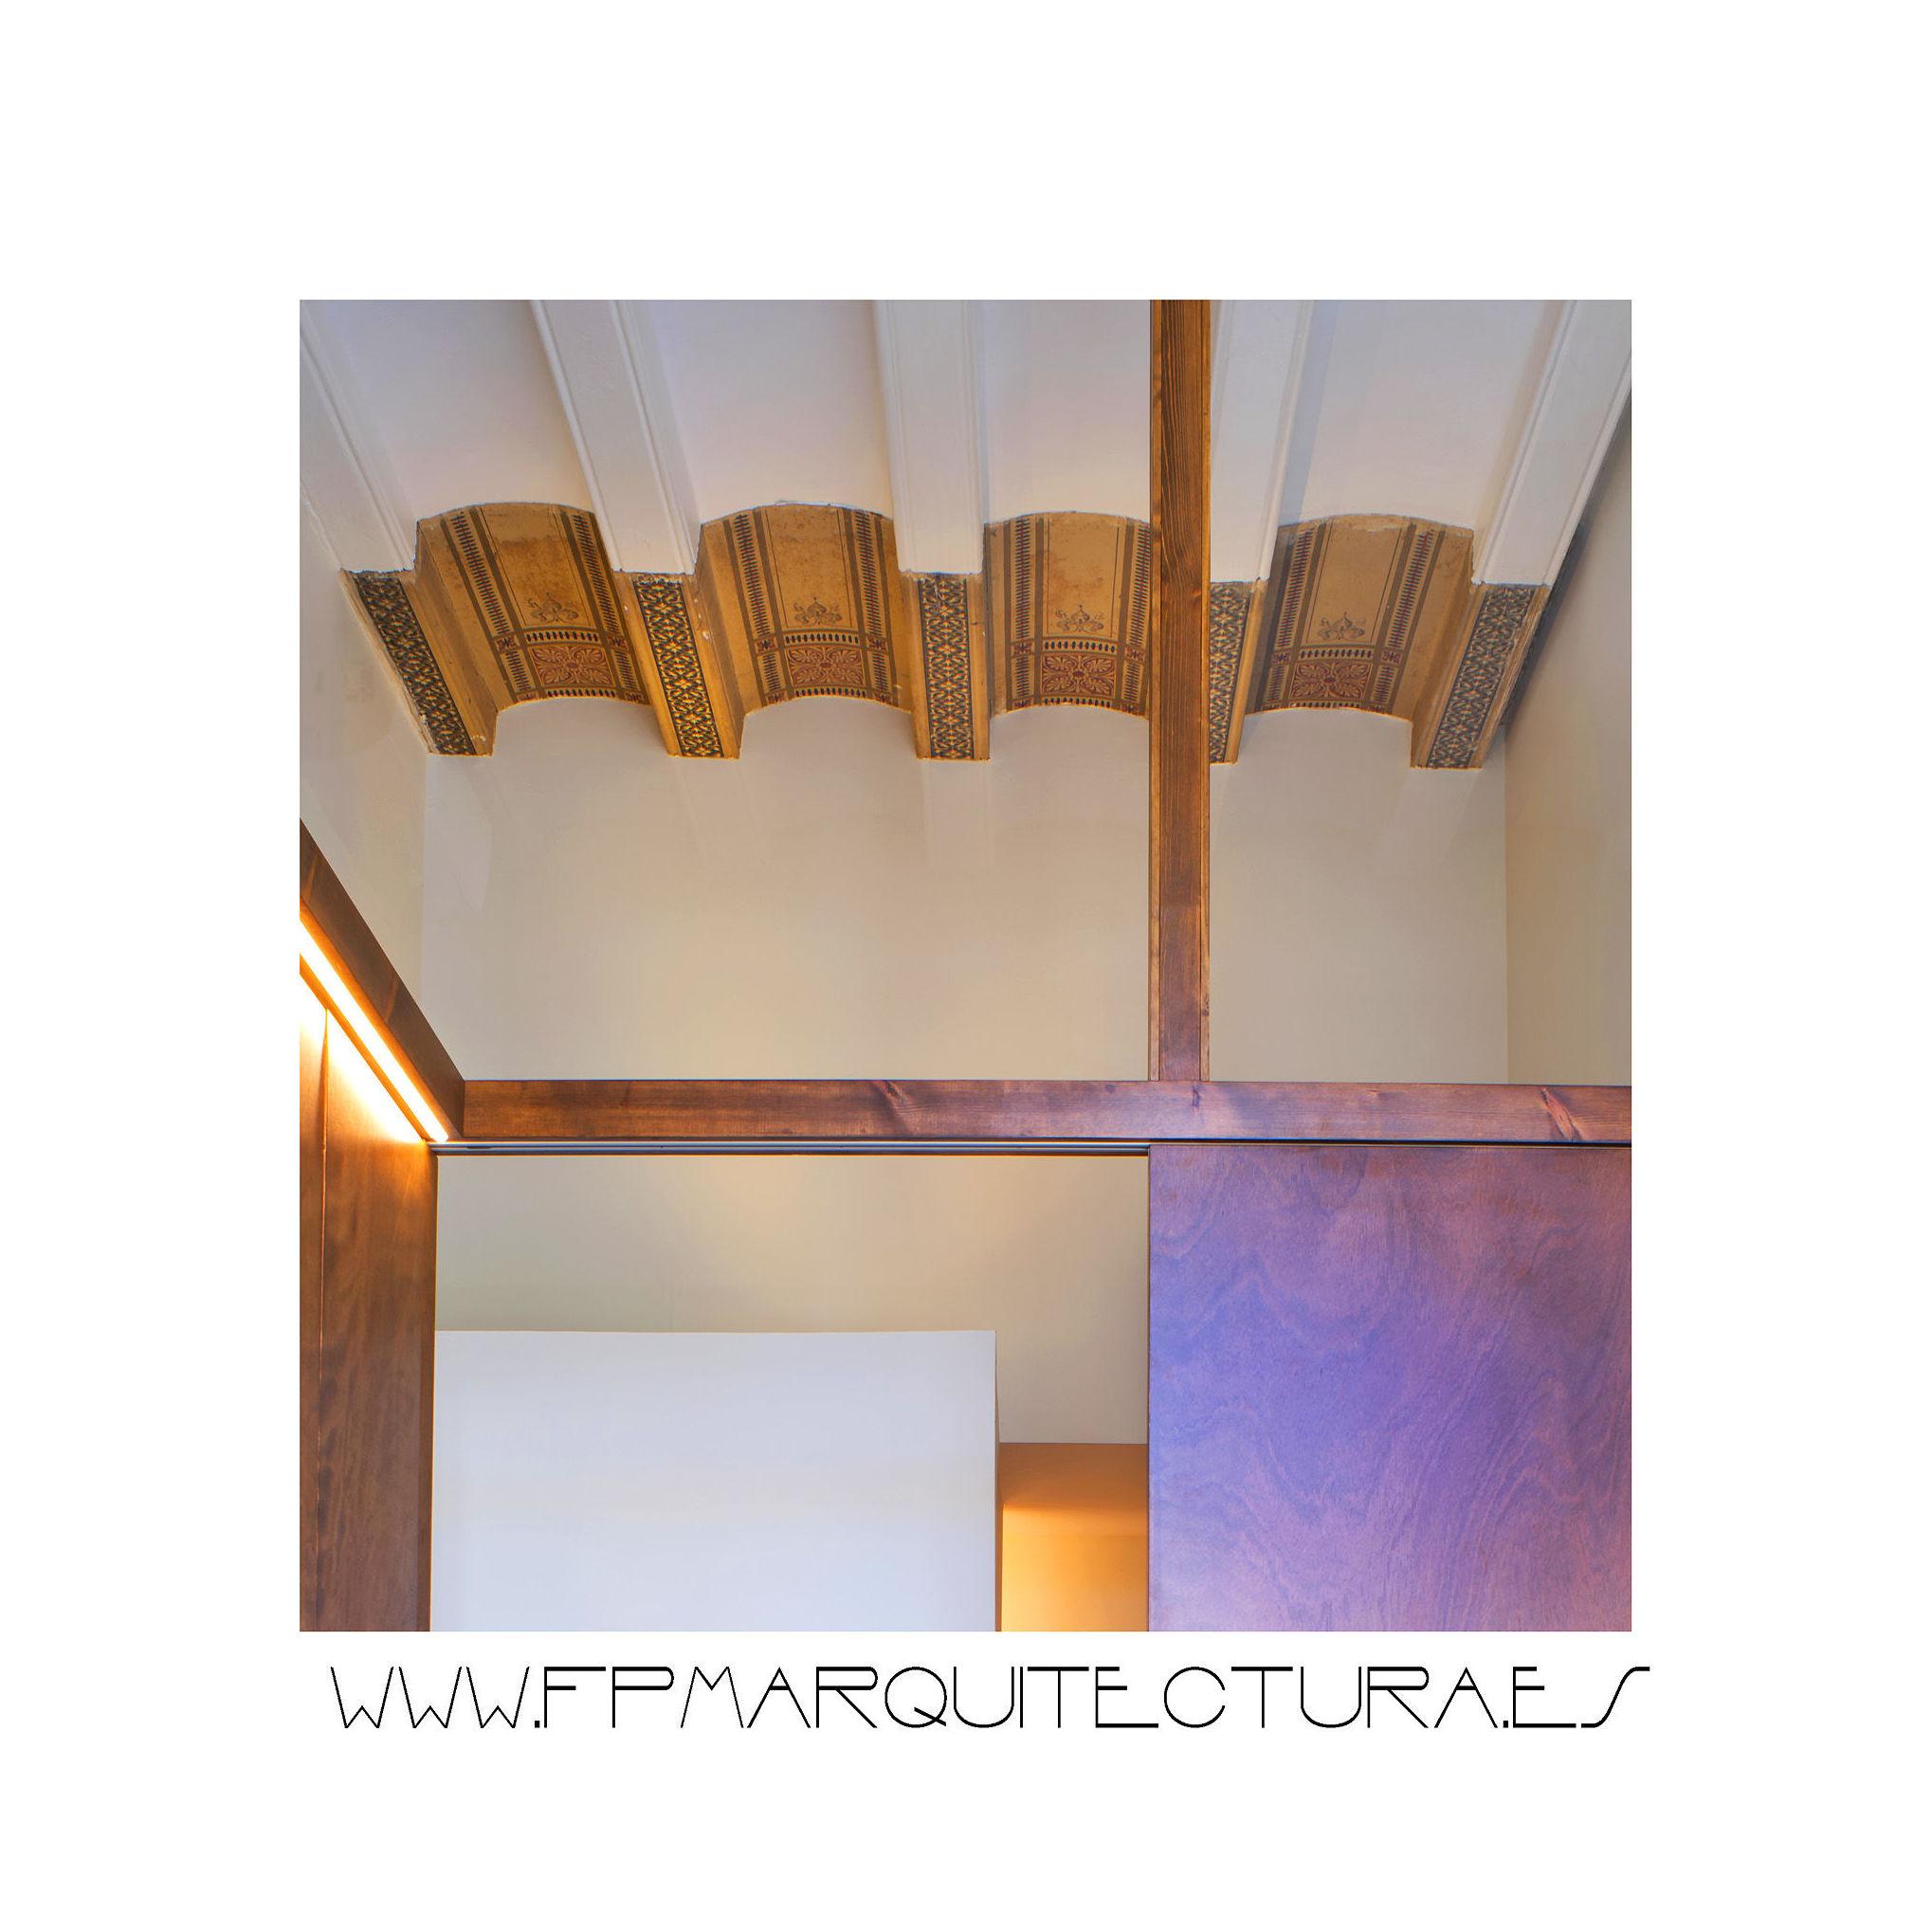 Carrer de Sant Francesc  #sitges #contemporanyarcchitecture #catalanarchitecture #fpmarquitectura #barcelona